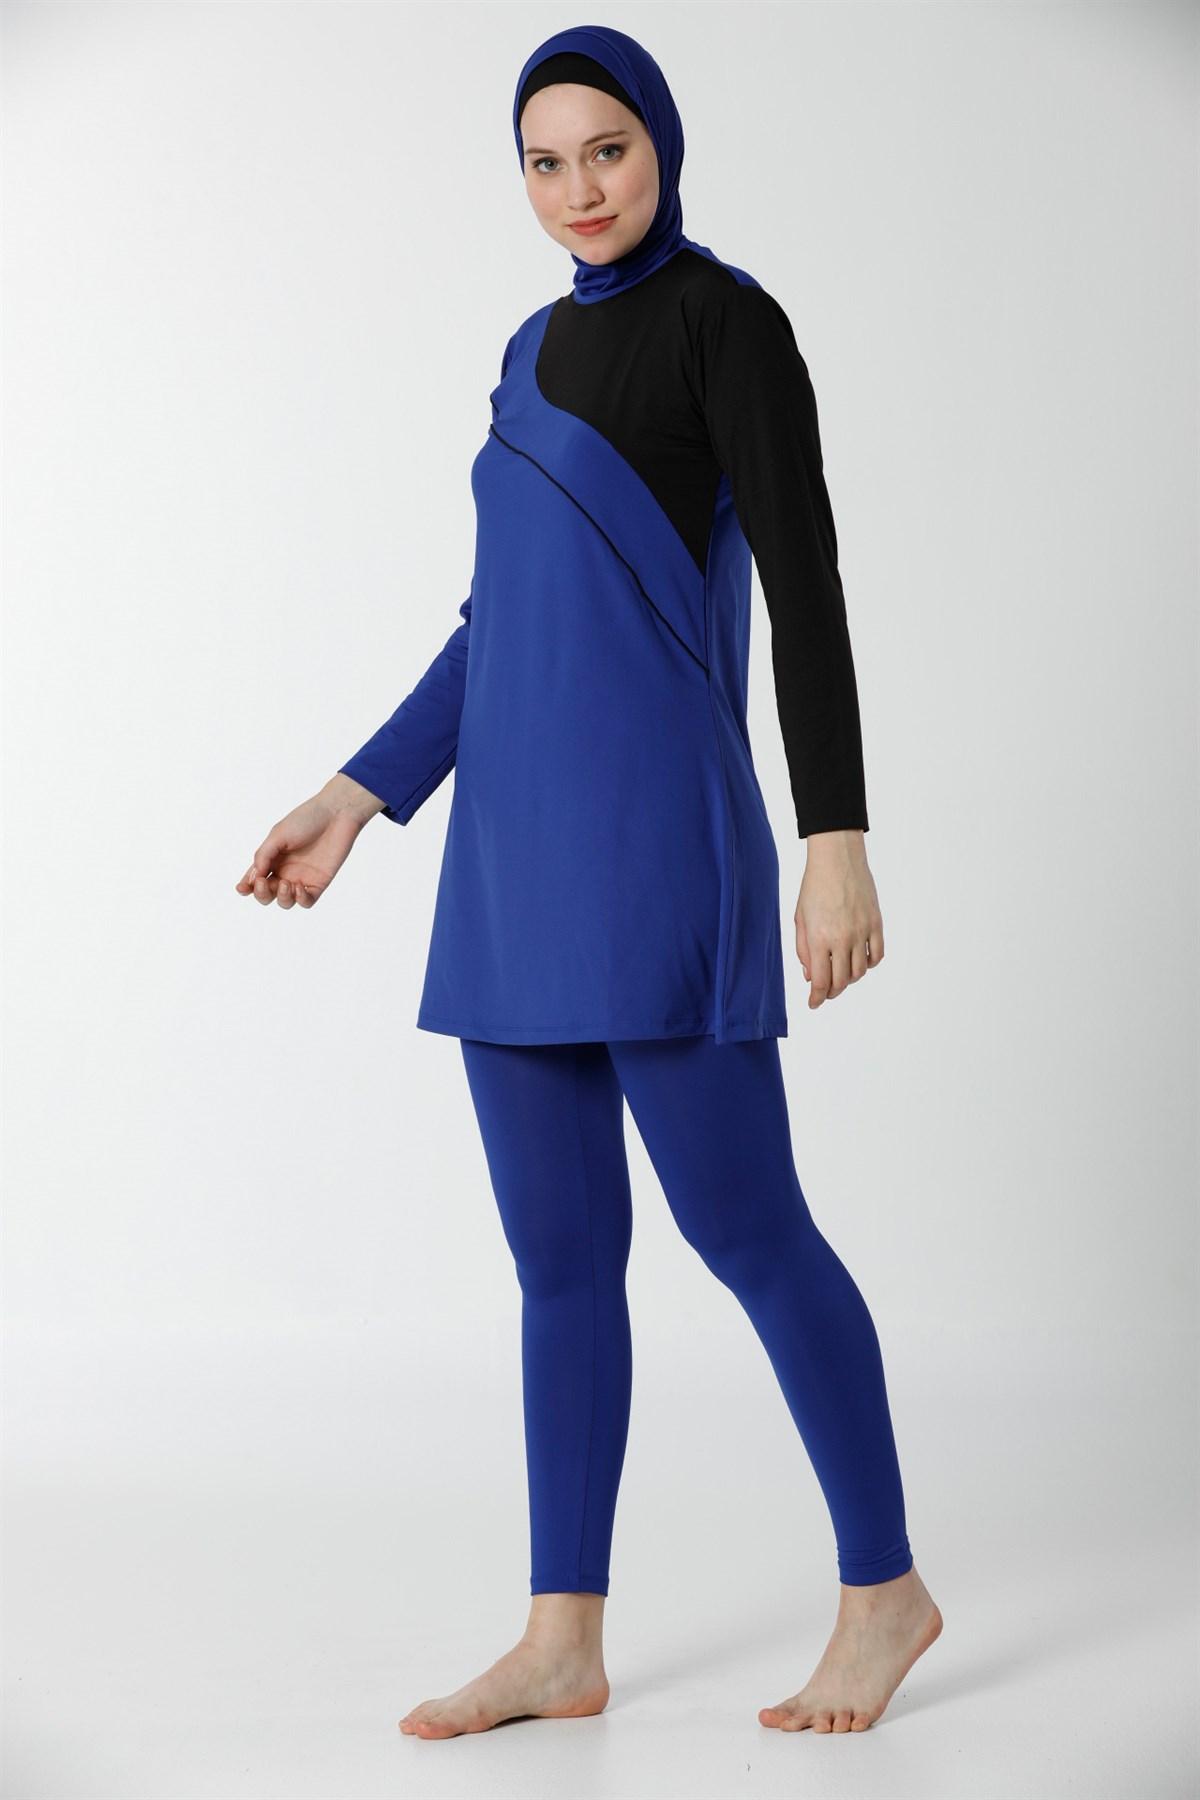 Moda Çizgi Tam Kapalı Taytlı Likralı Tesettür Mayo 28099